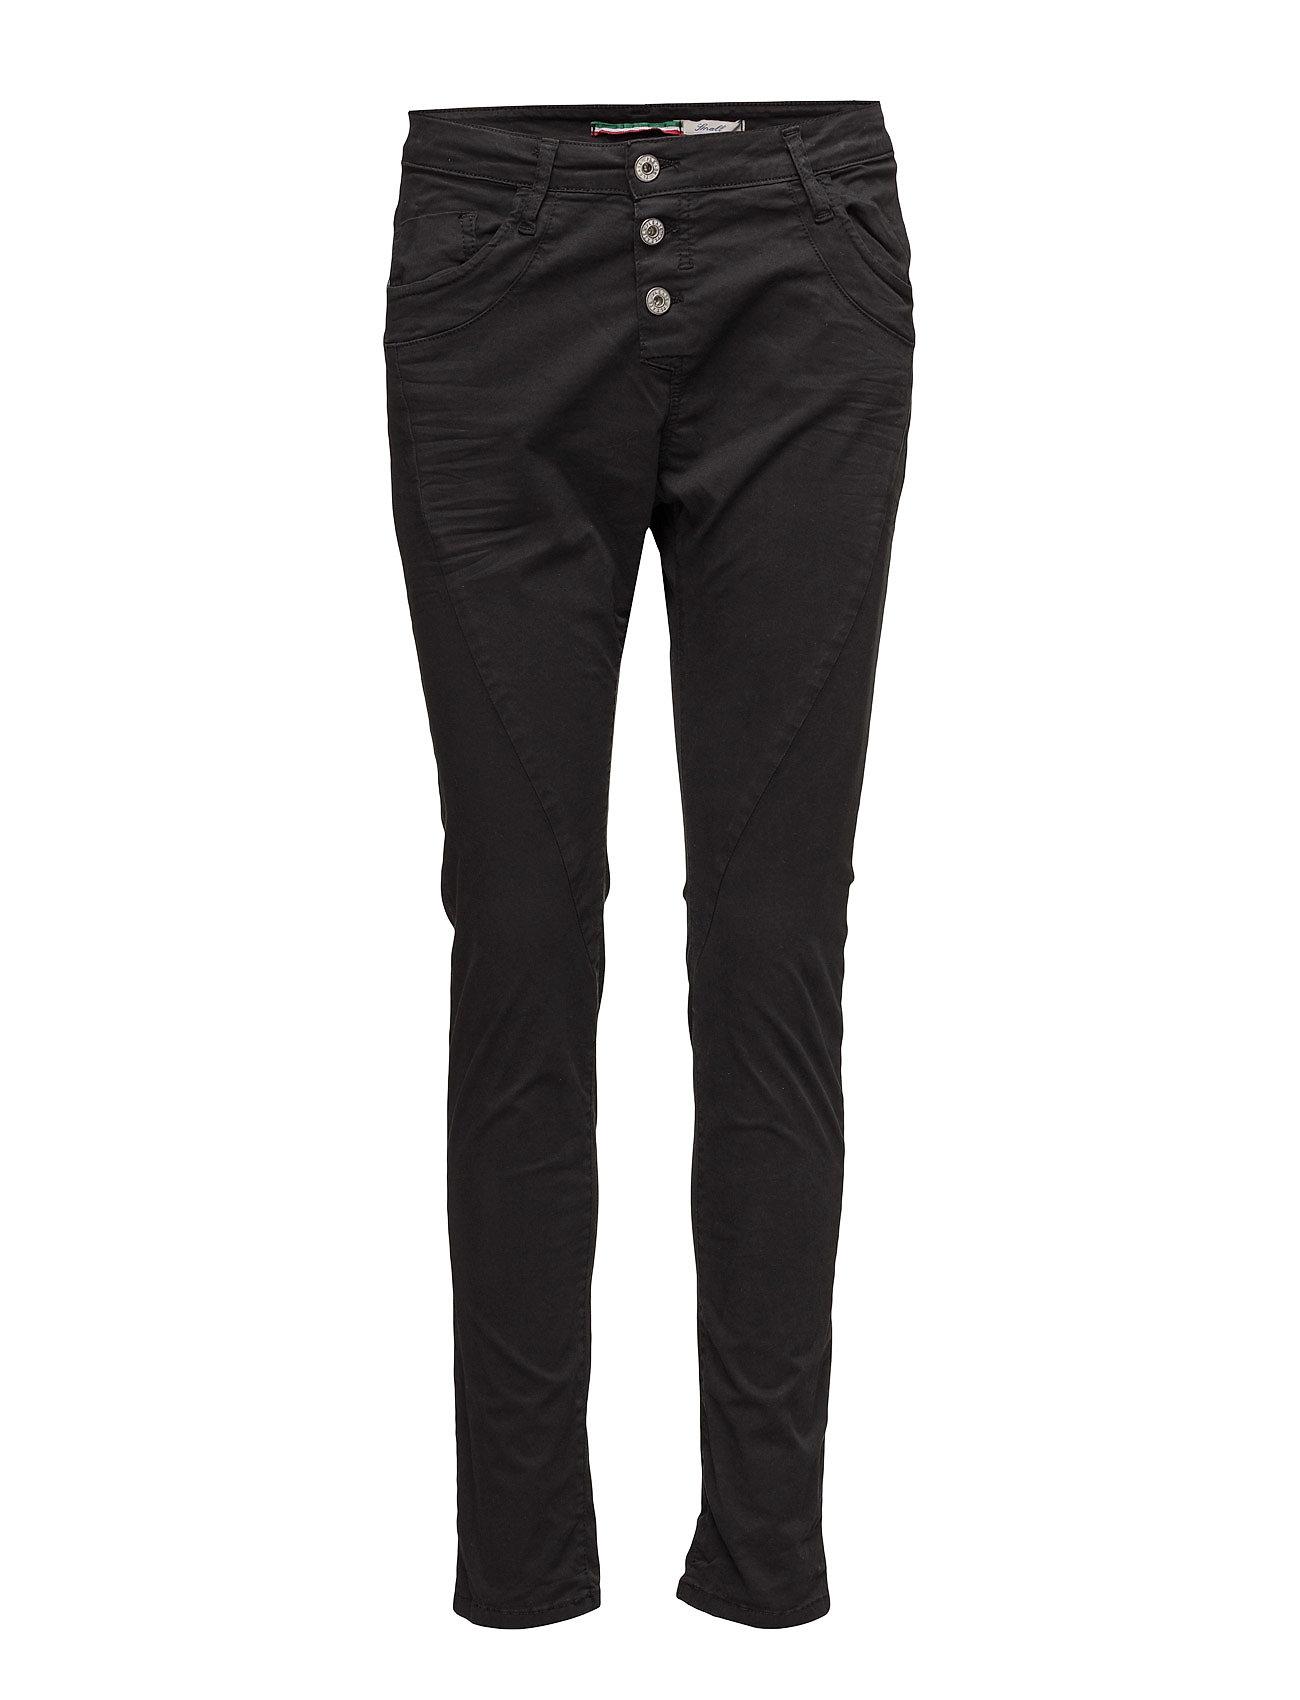 Classic Shiny Nero Please Jeans Skinny til Damer i Sort